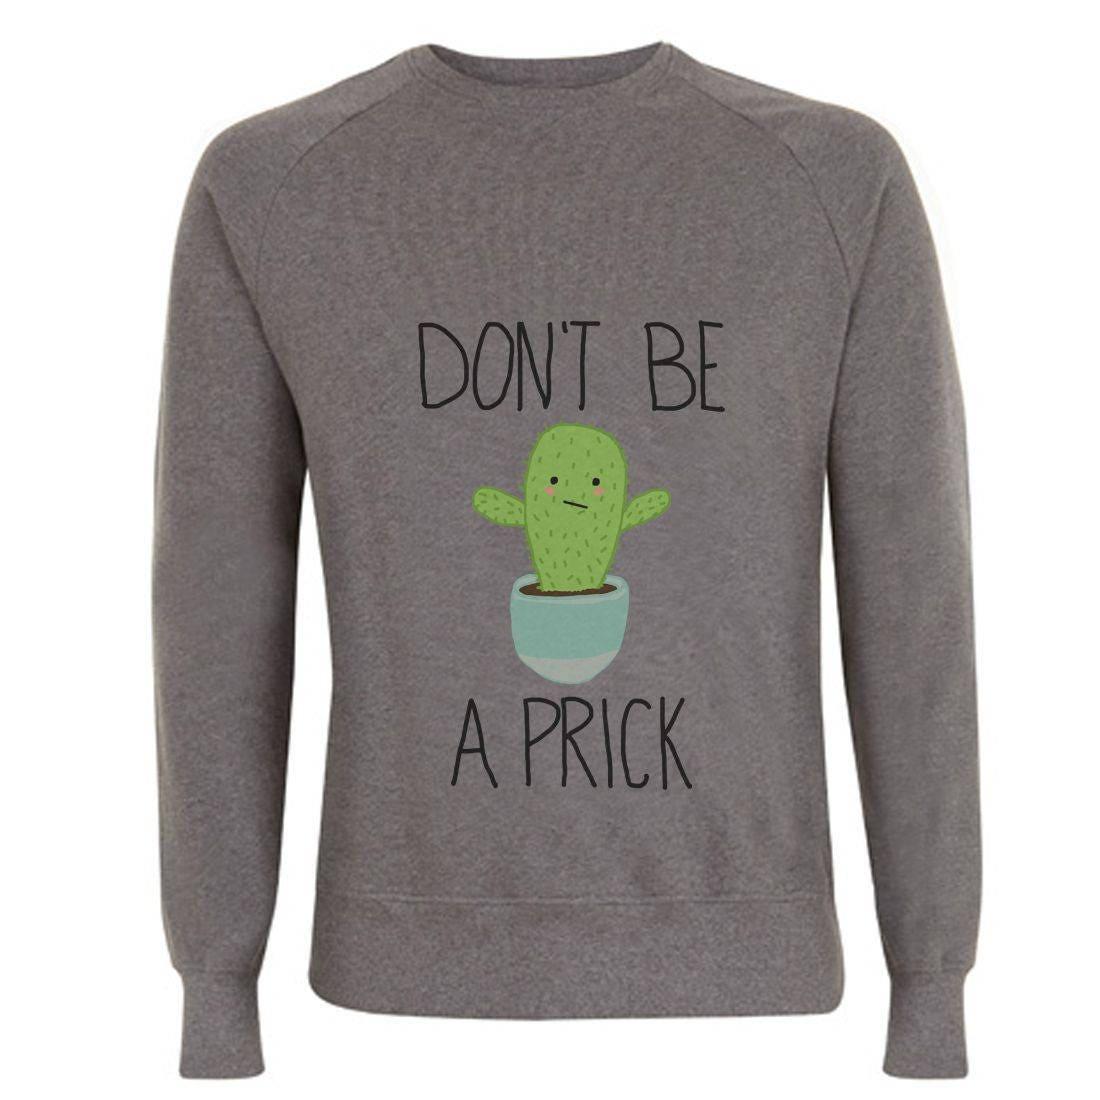 Ne soyez pas une piqûre Cactus pull - sweat Sweater gris unisexe - bio - Slogan Sweater sweat - Cactus Fashion en coton 1e7054